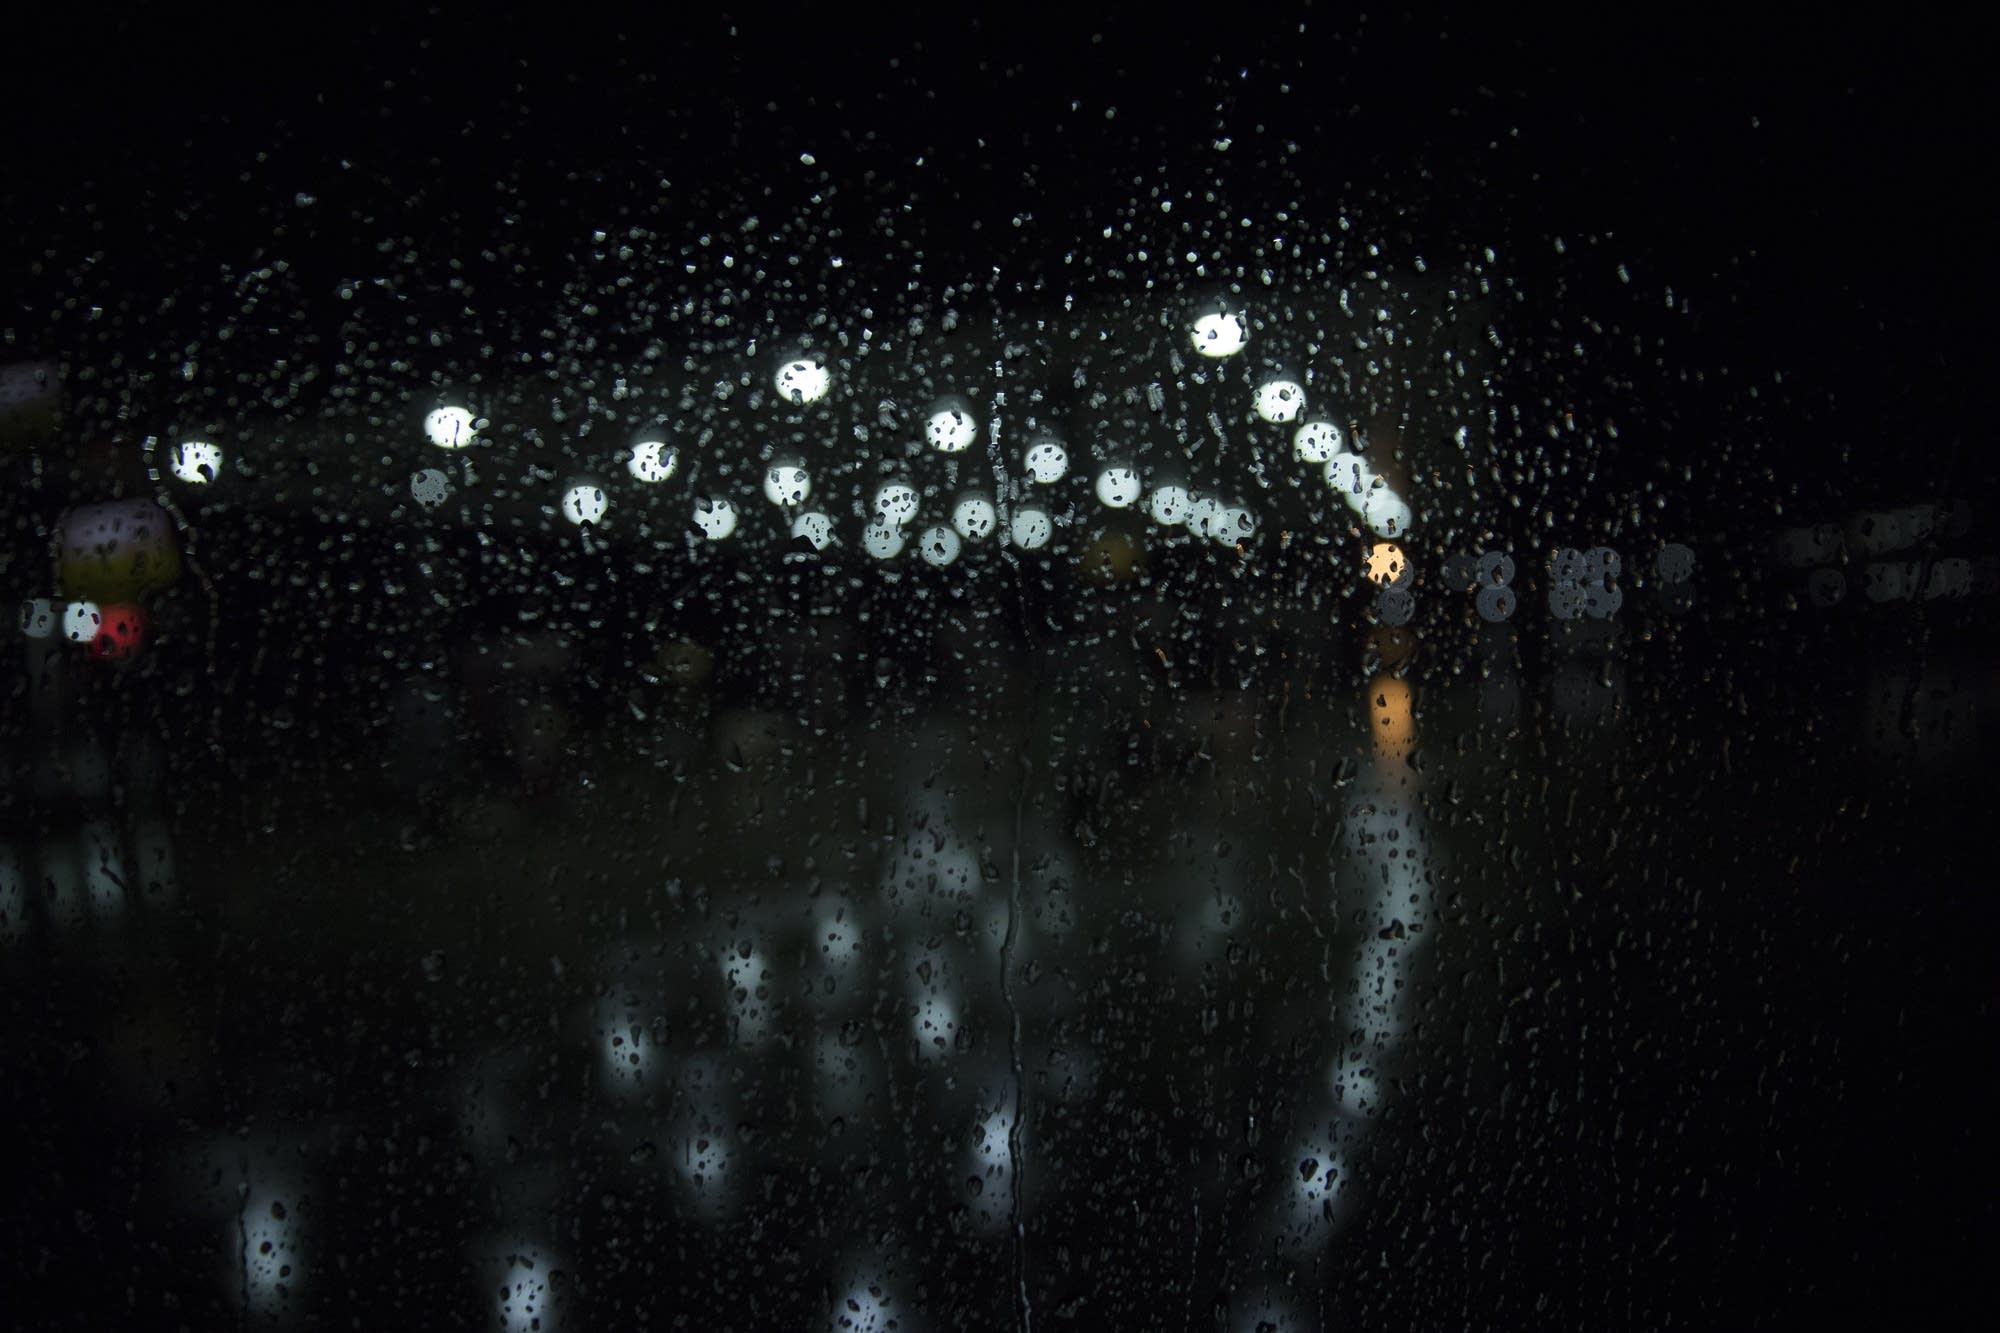 Rain drips down the window of the charter bus.